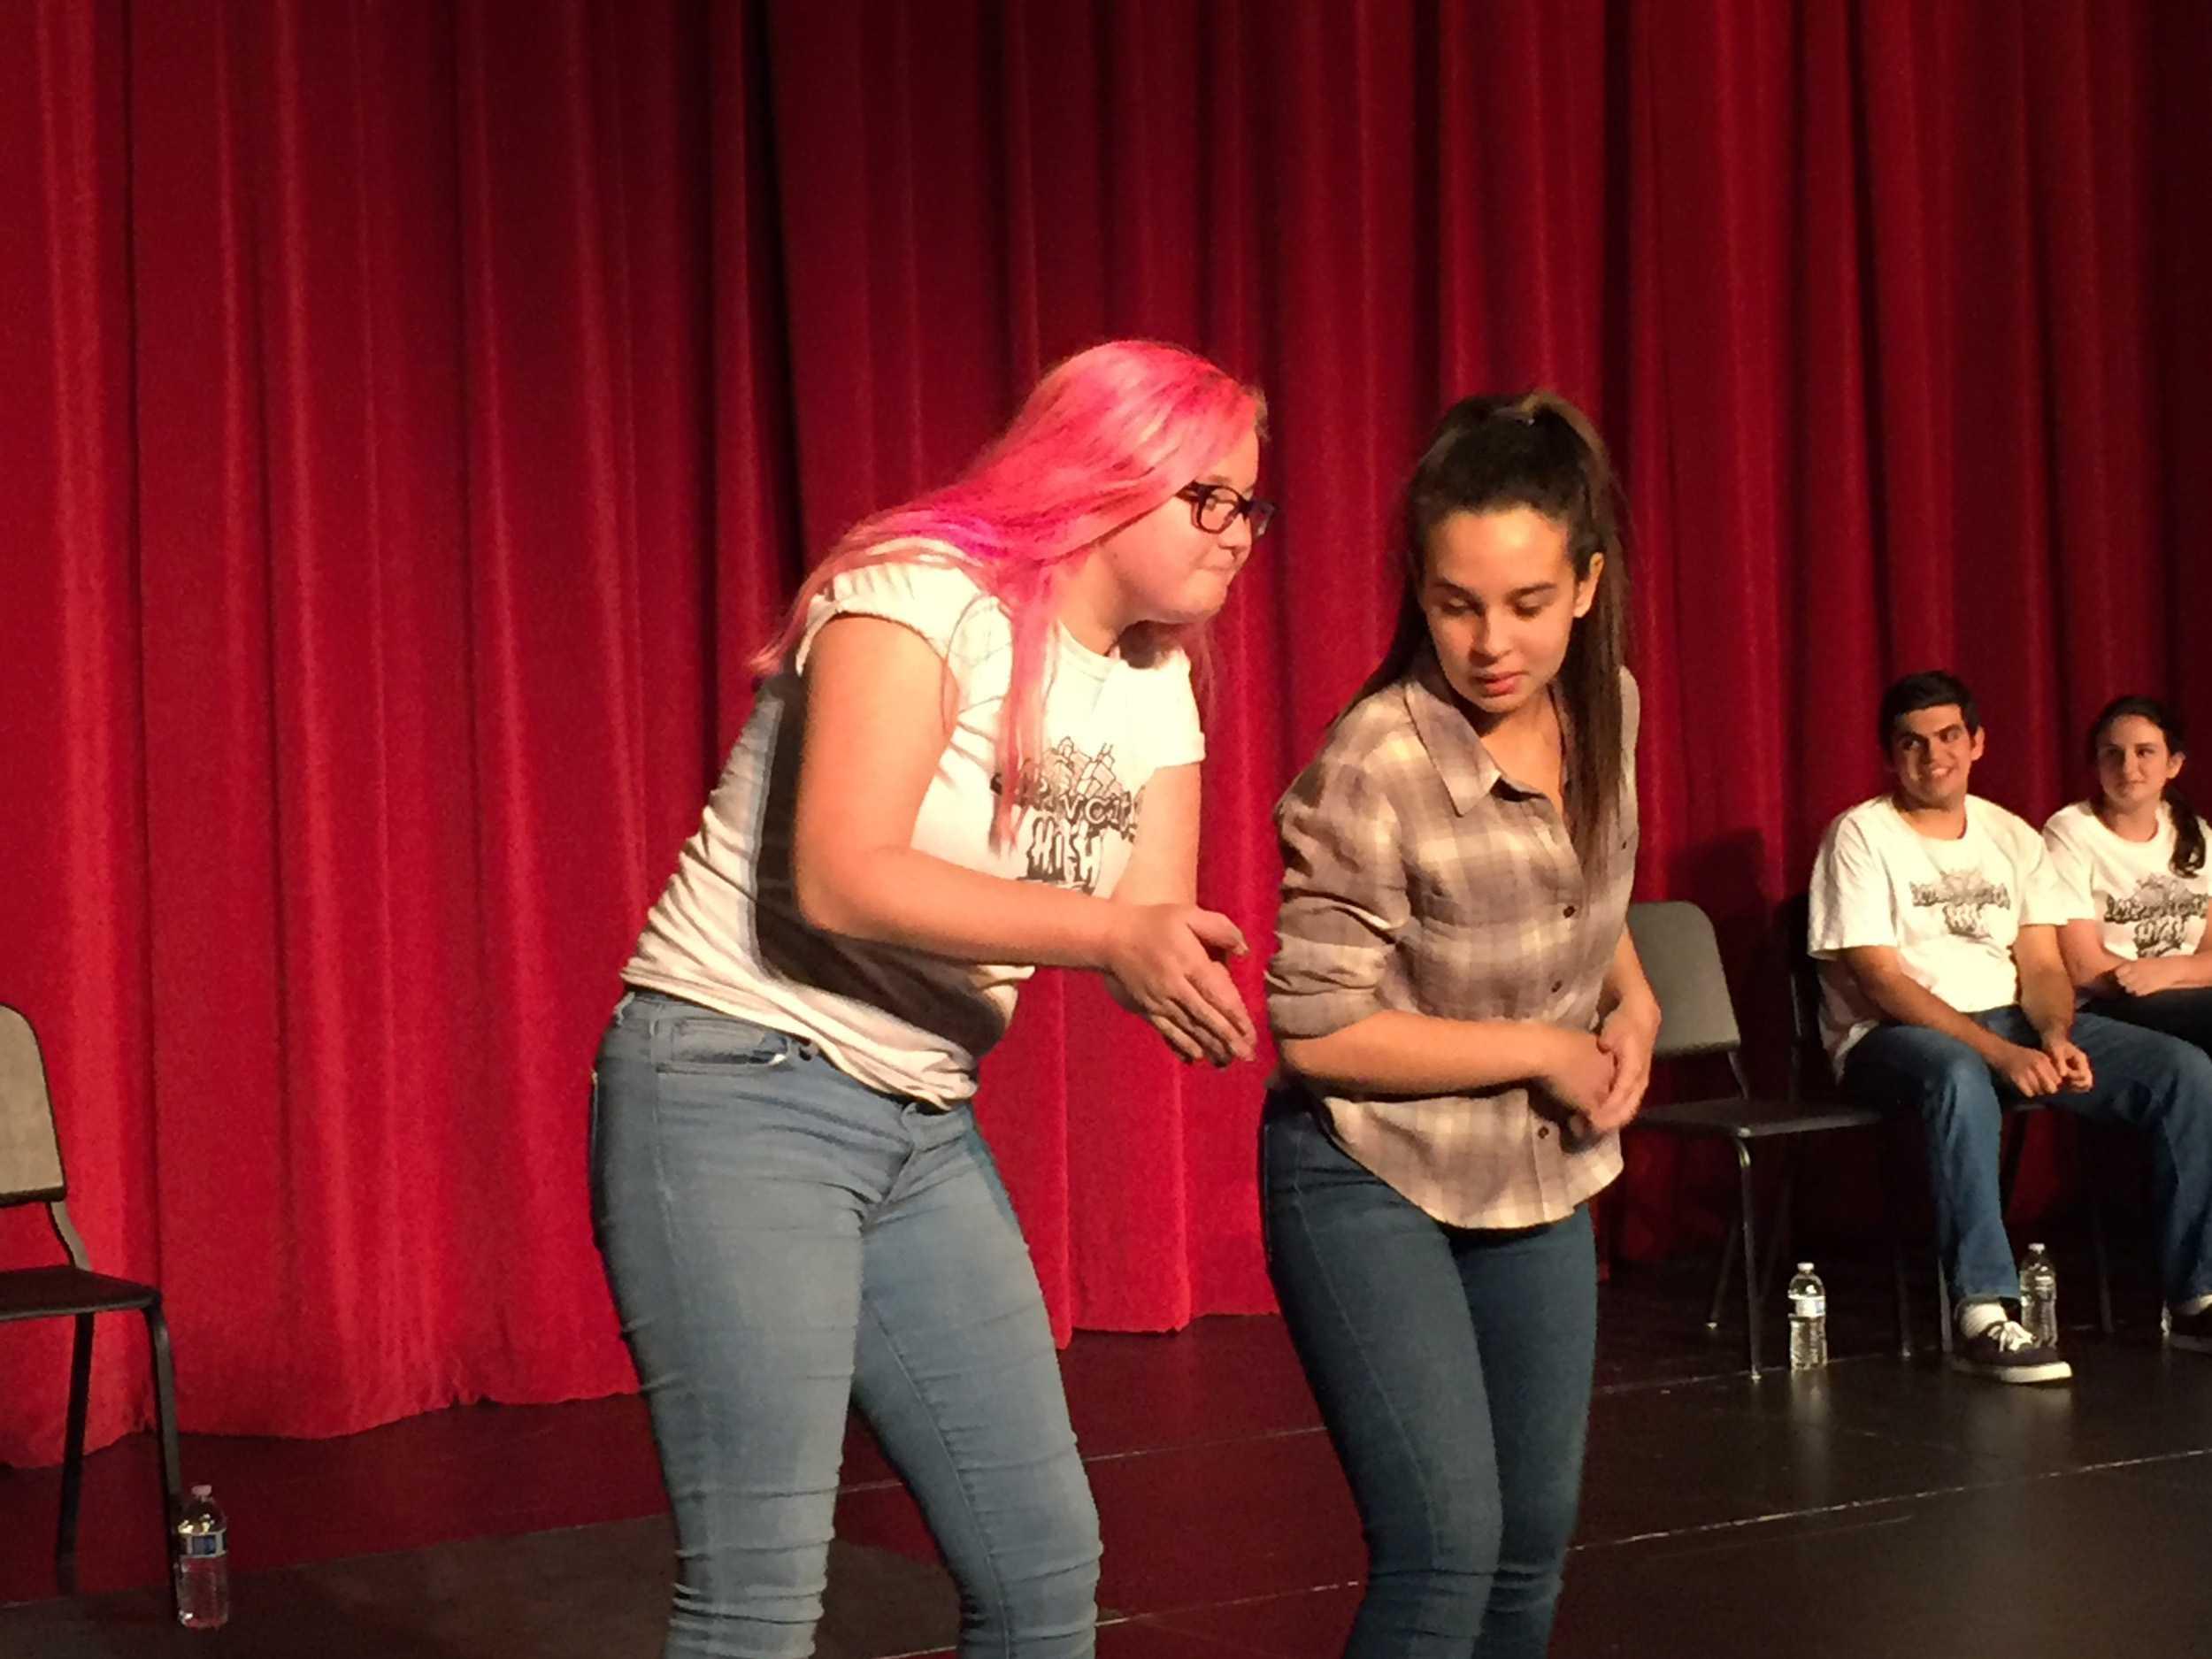 Alumni Gabi Feliciano and junior Rowan Biggs help fill the theater with laughter.